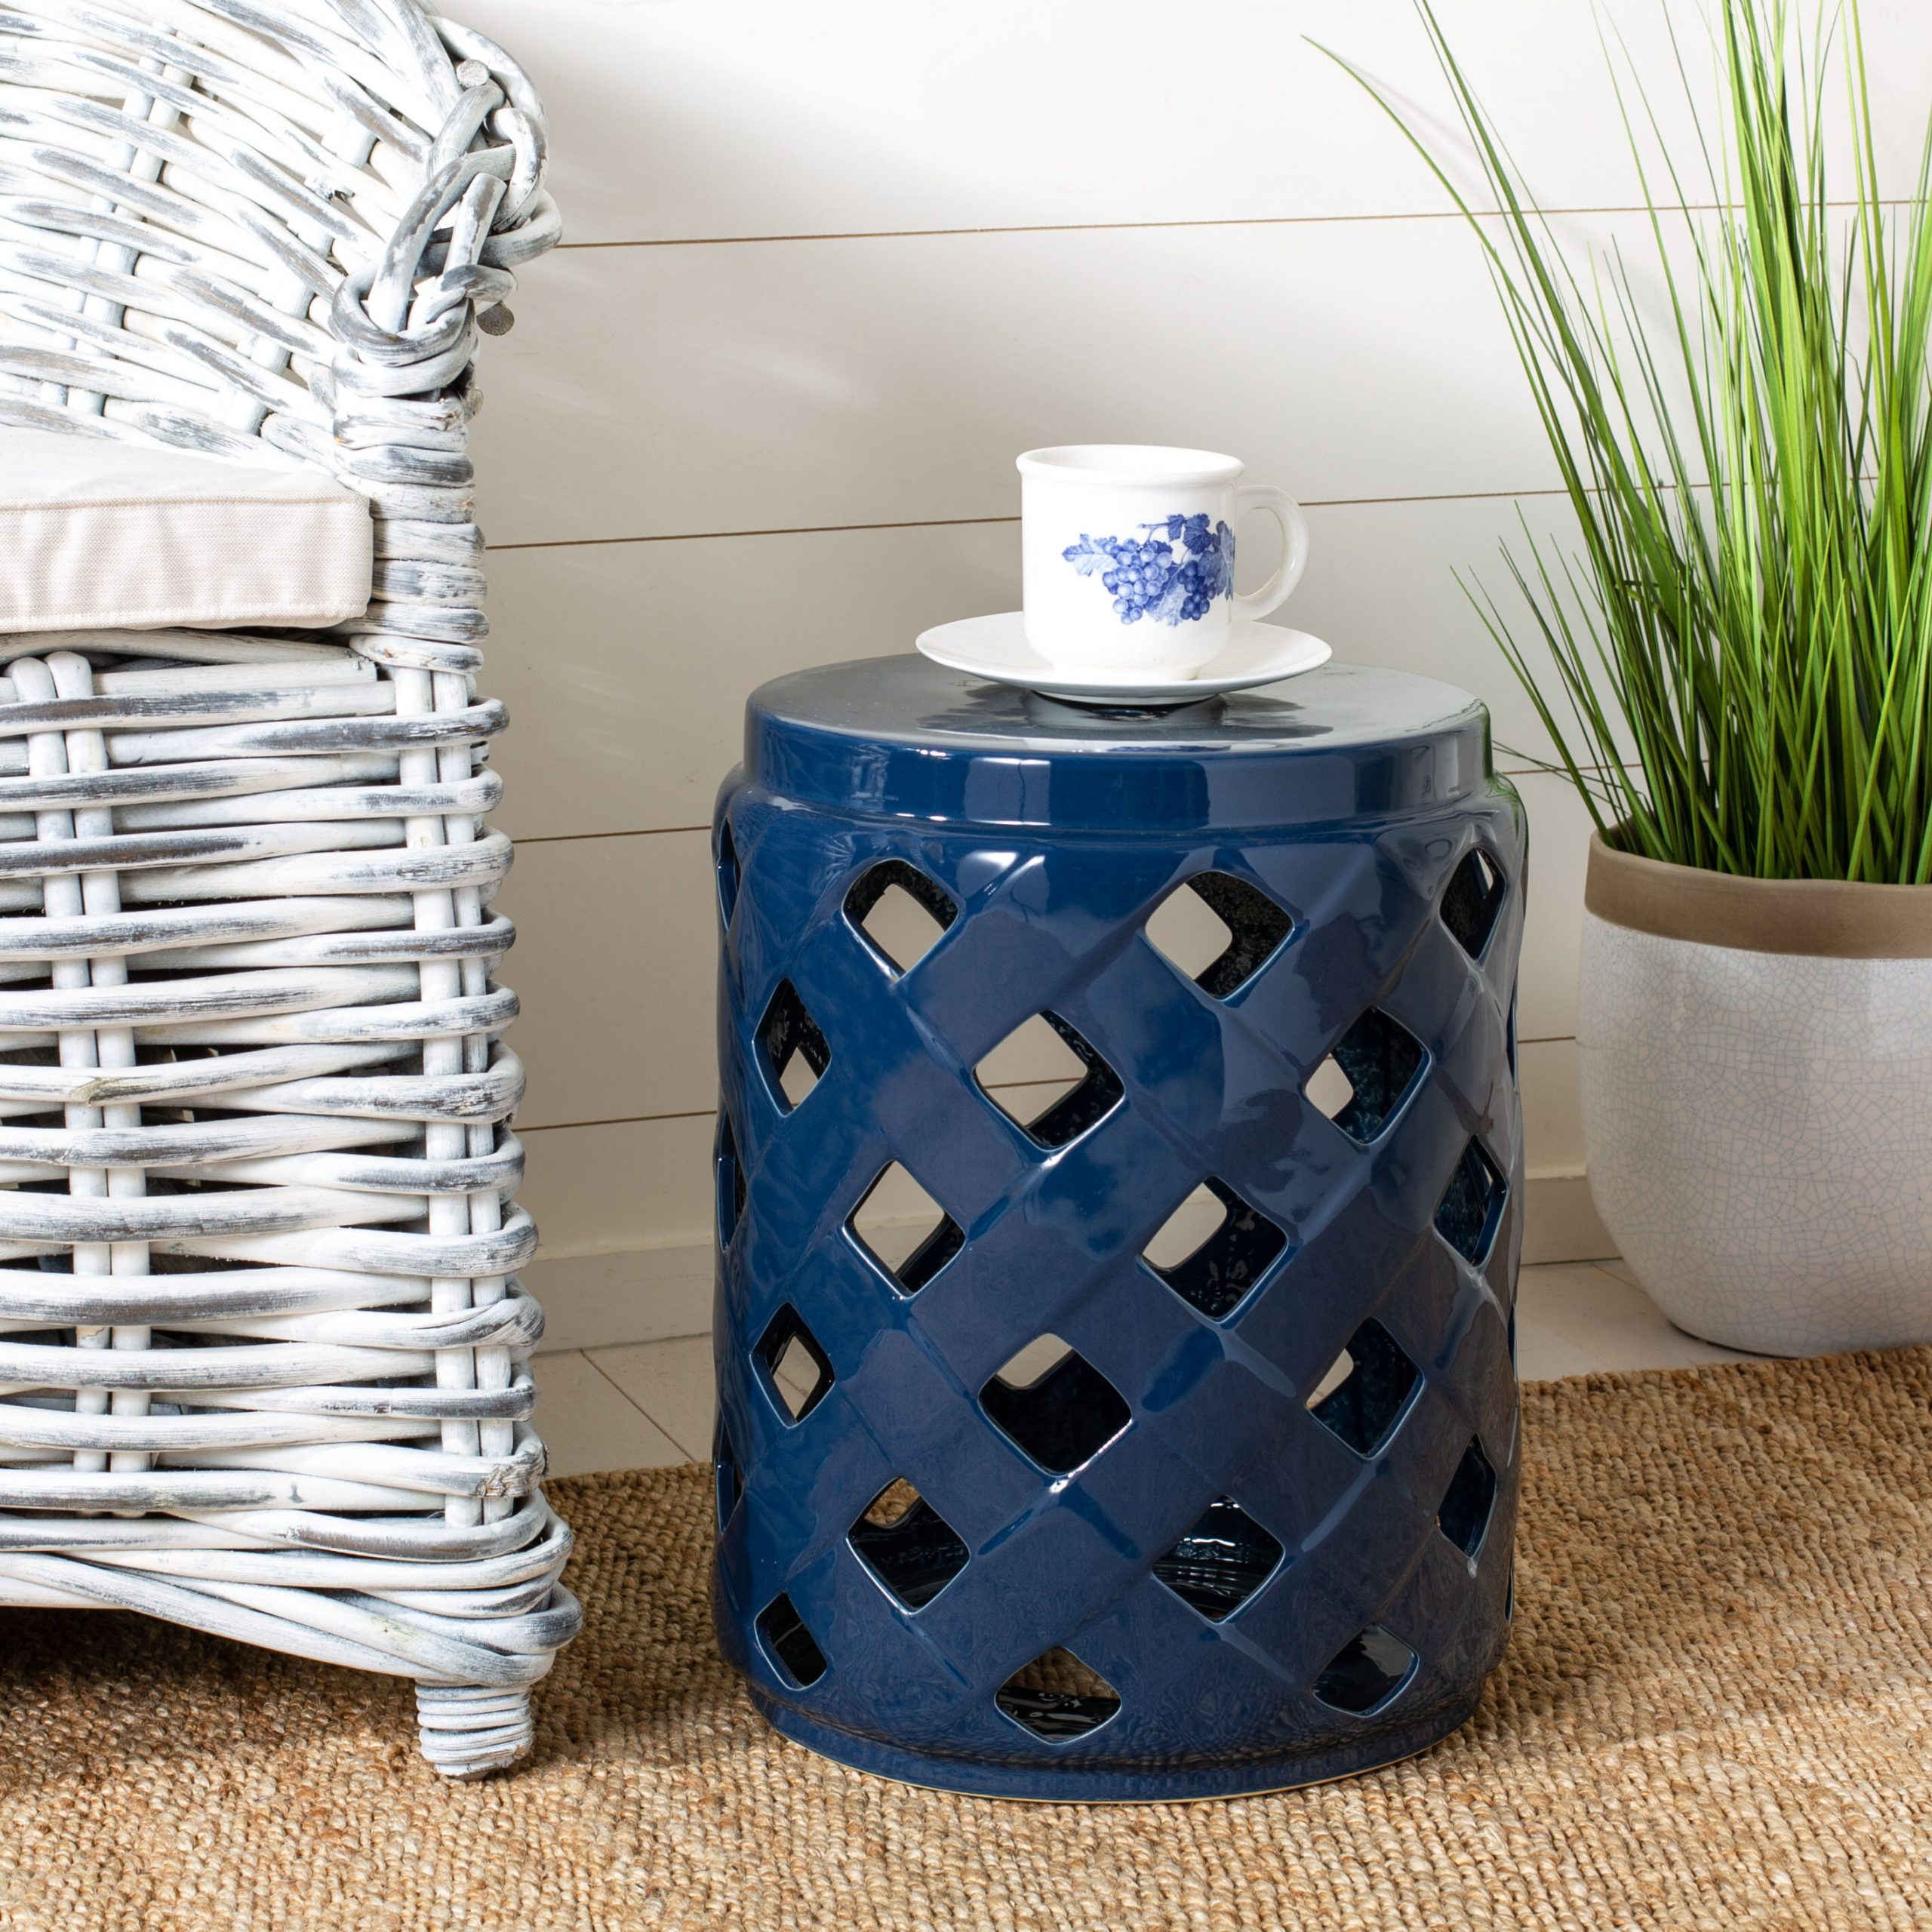 Ceramic Garden Accent Stools You'Ll Love In 2020 | Wayfair Regarding Engelhardt Ceramic Garden Stools (View 6 of 25)